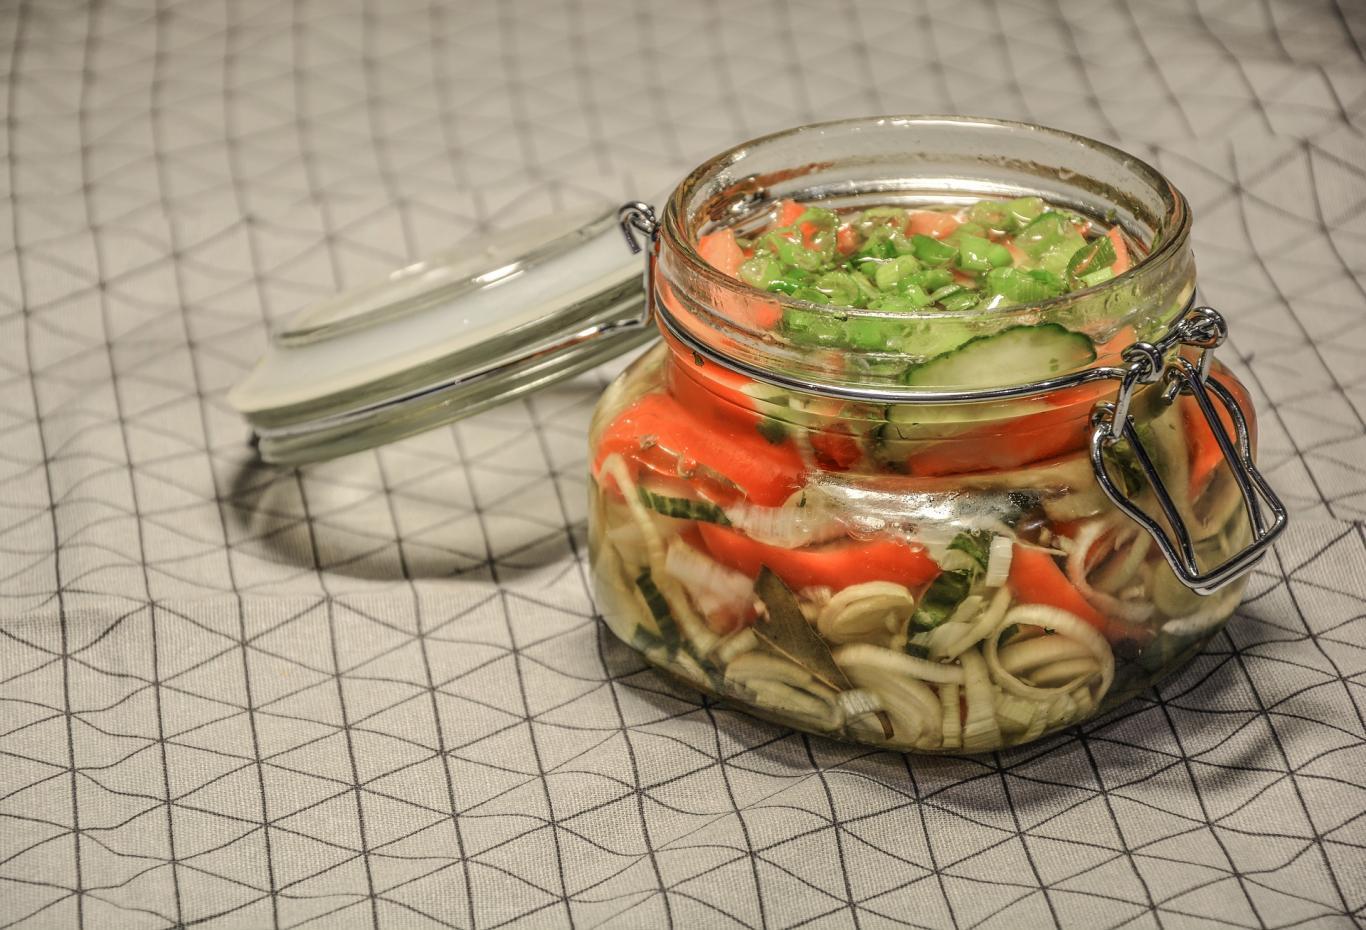 Tarro abierto de conserva casera con verduras